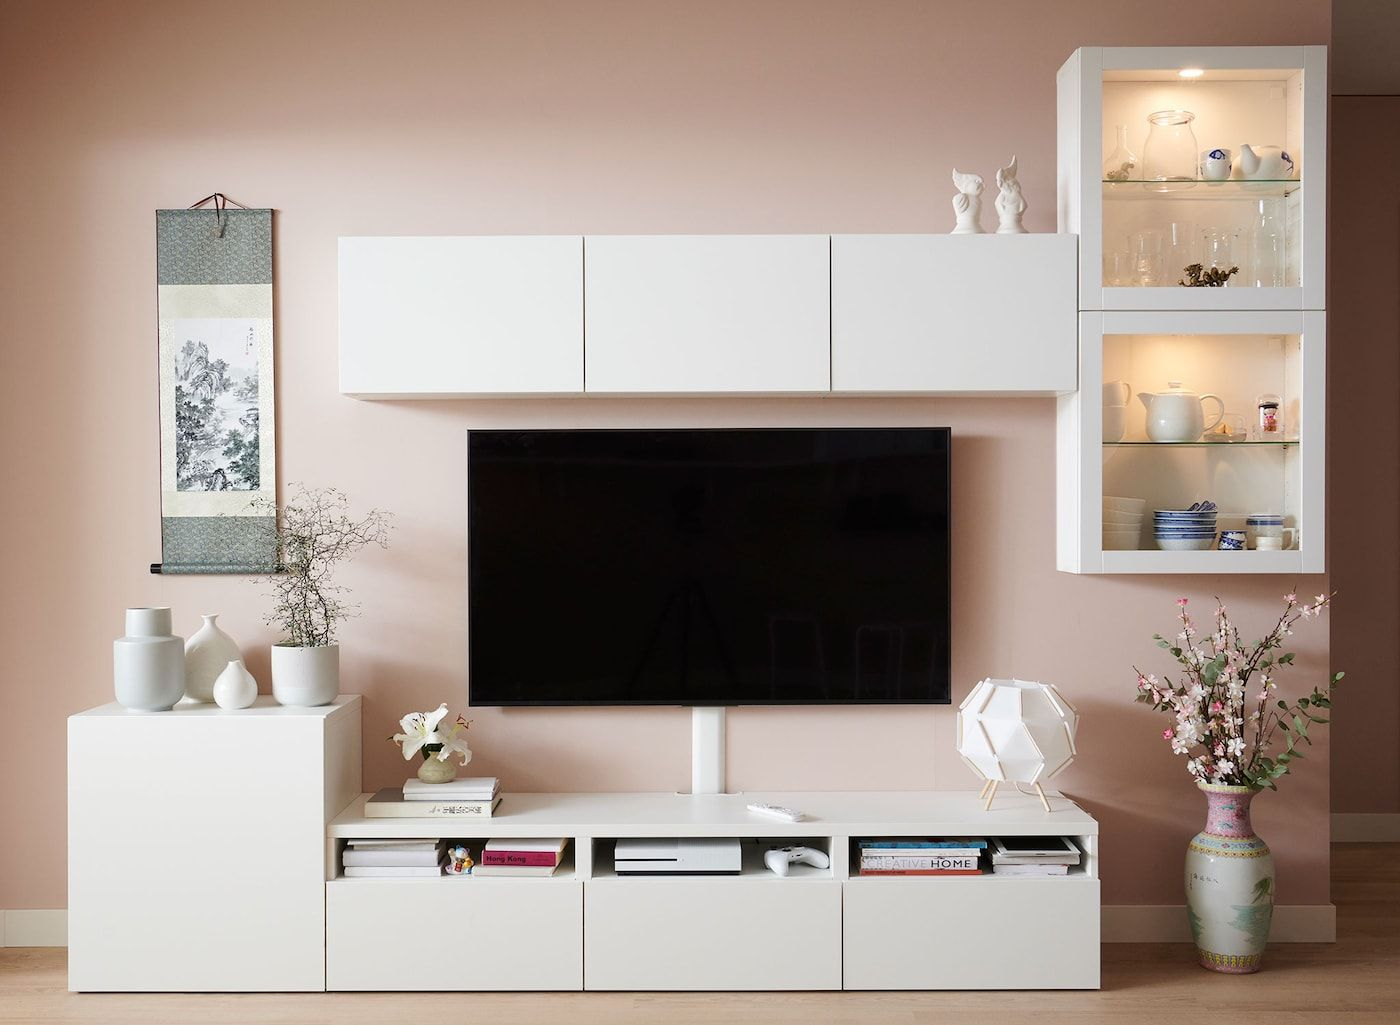 Planning Tools Ikea Ikea Living Room Tv Wall Decor Ikea Living Room Storage